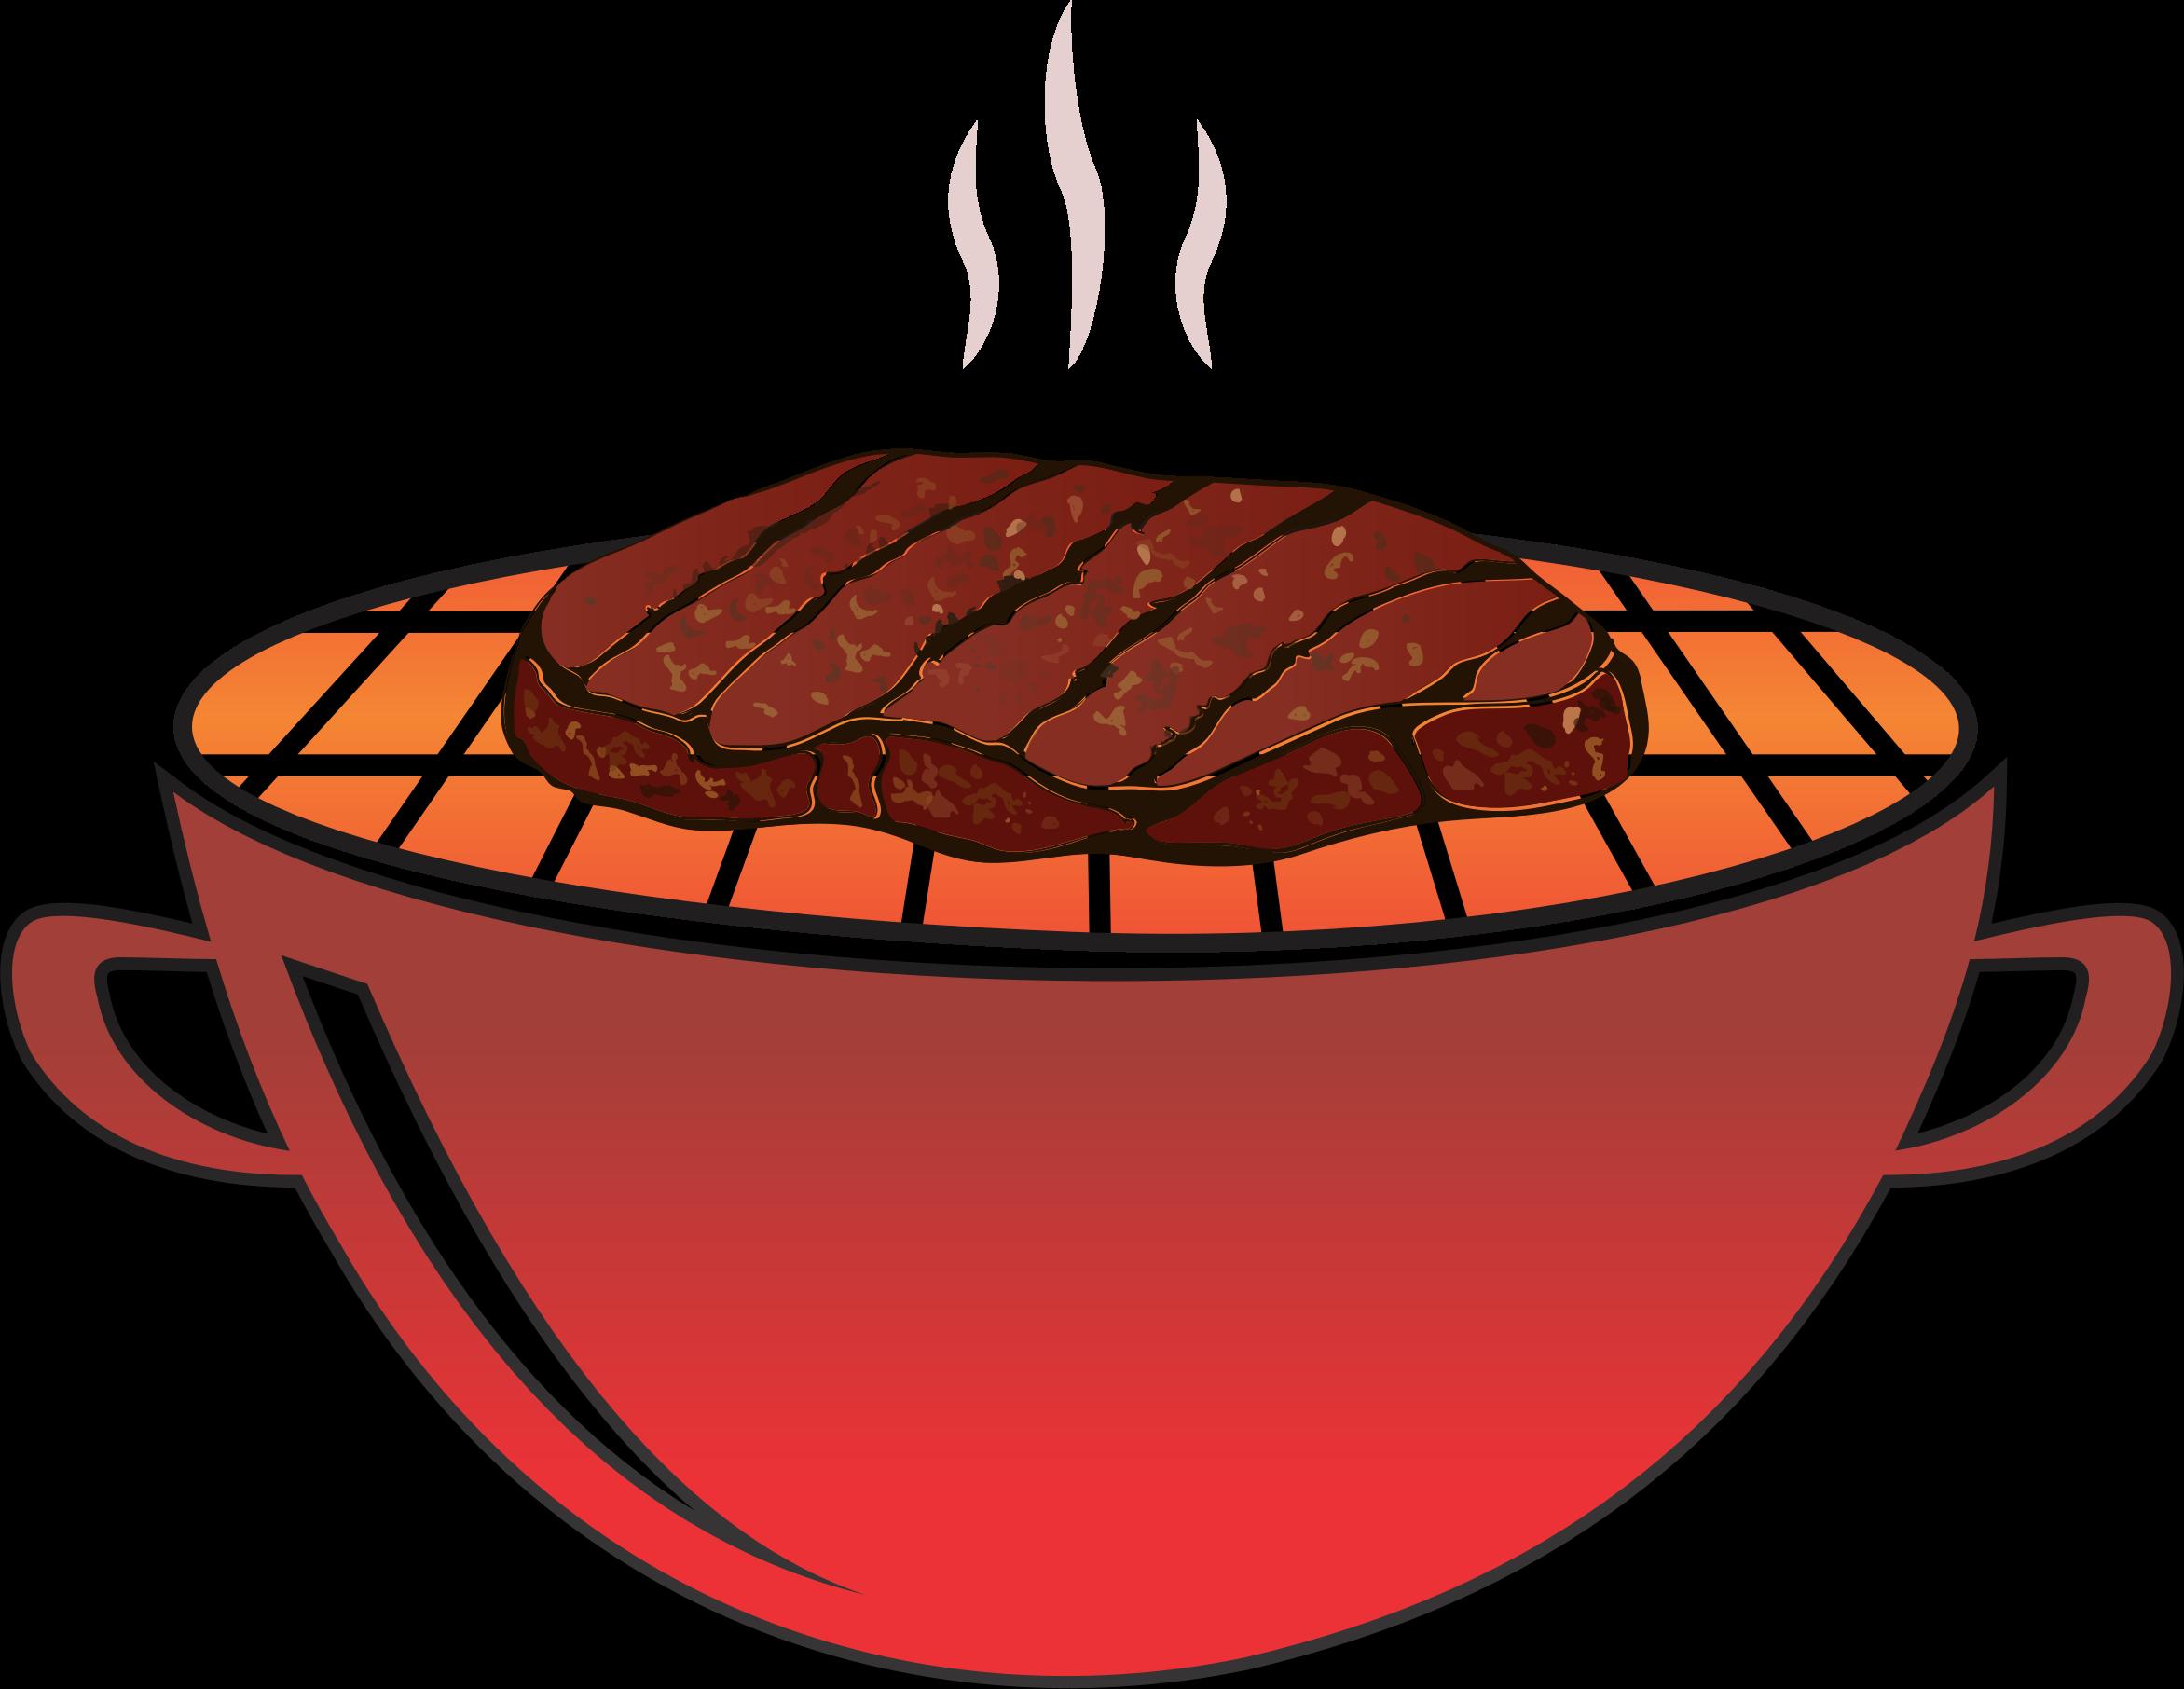 Steak clipart transparent Clipart Grilled Steak Grilled Steak